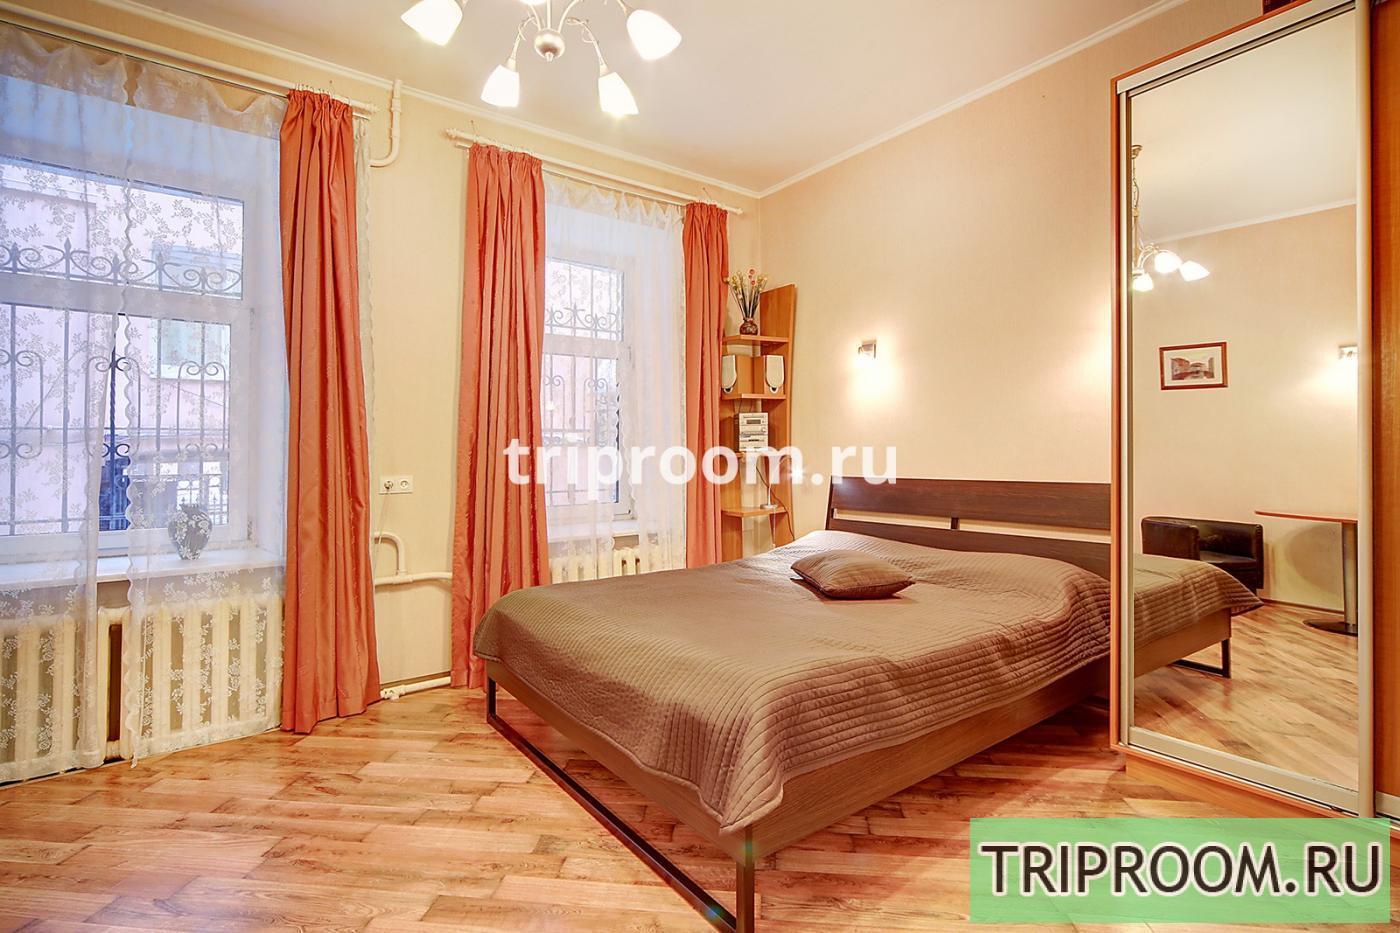 1-комнатная квартира посуточно (вариант № 15082), ул. Невский проспект, фото № 1